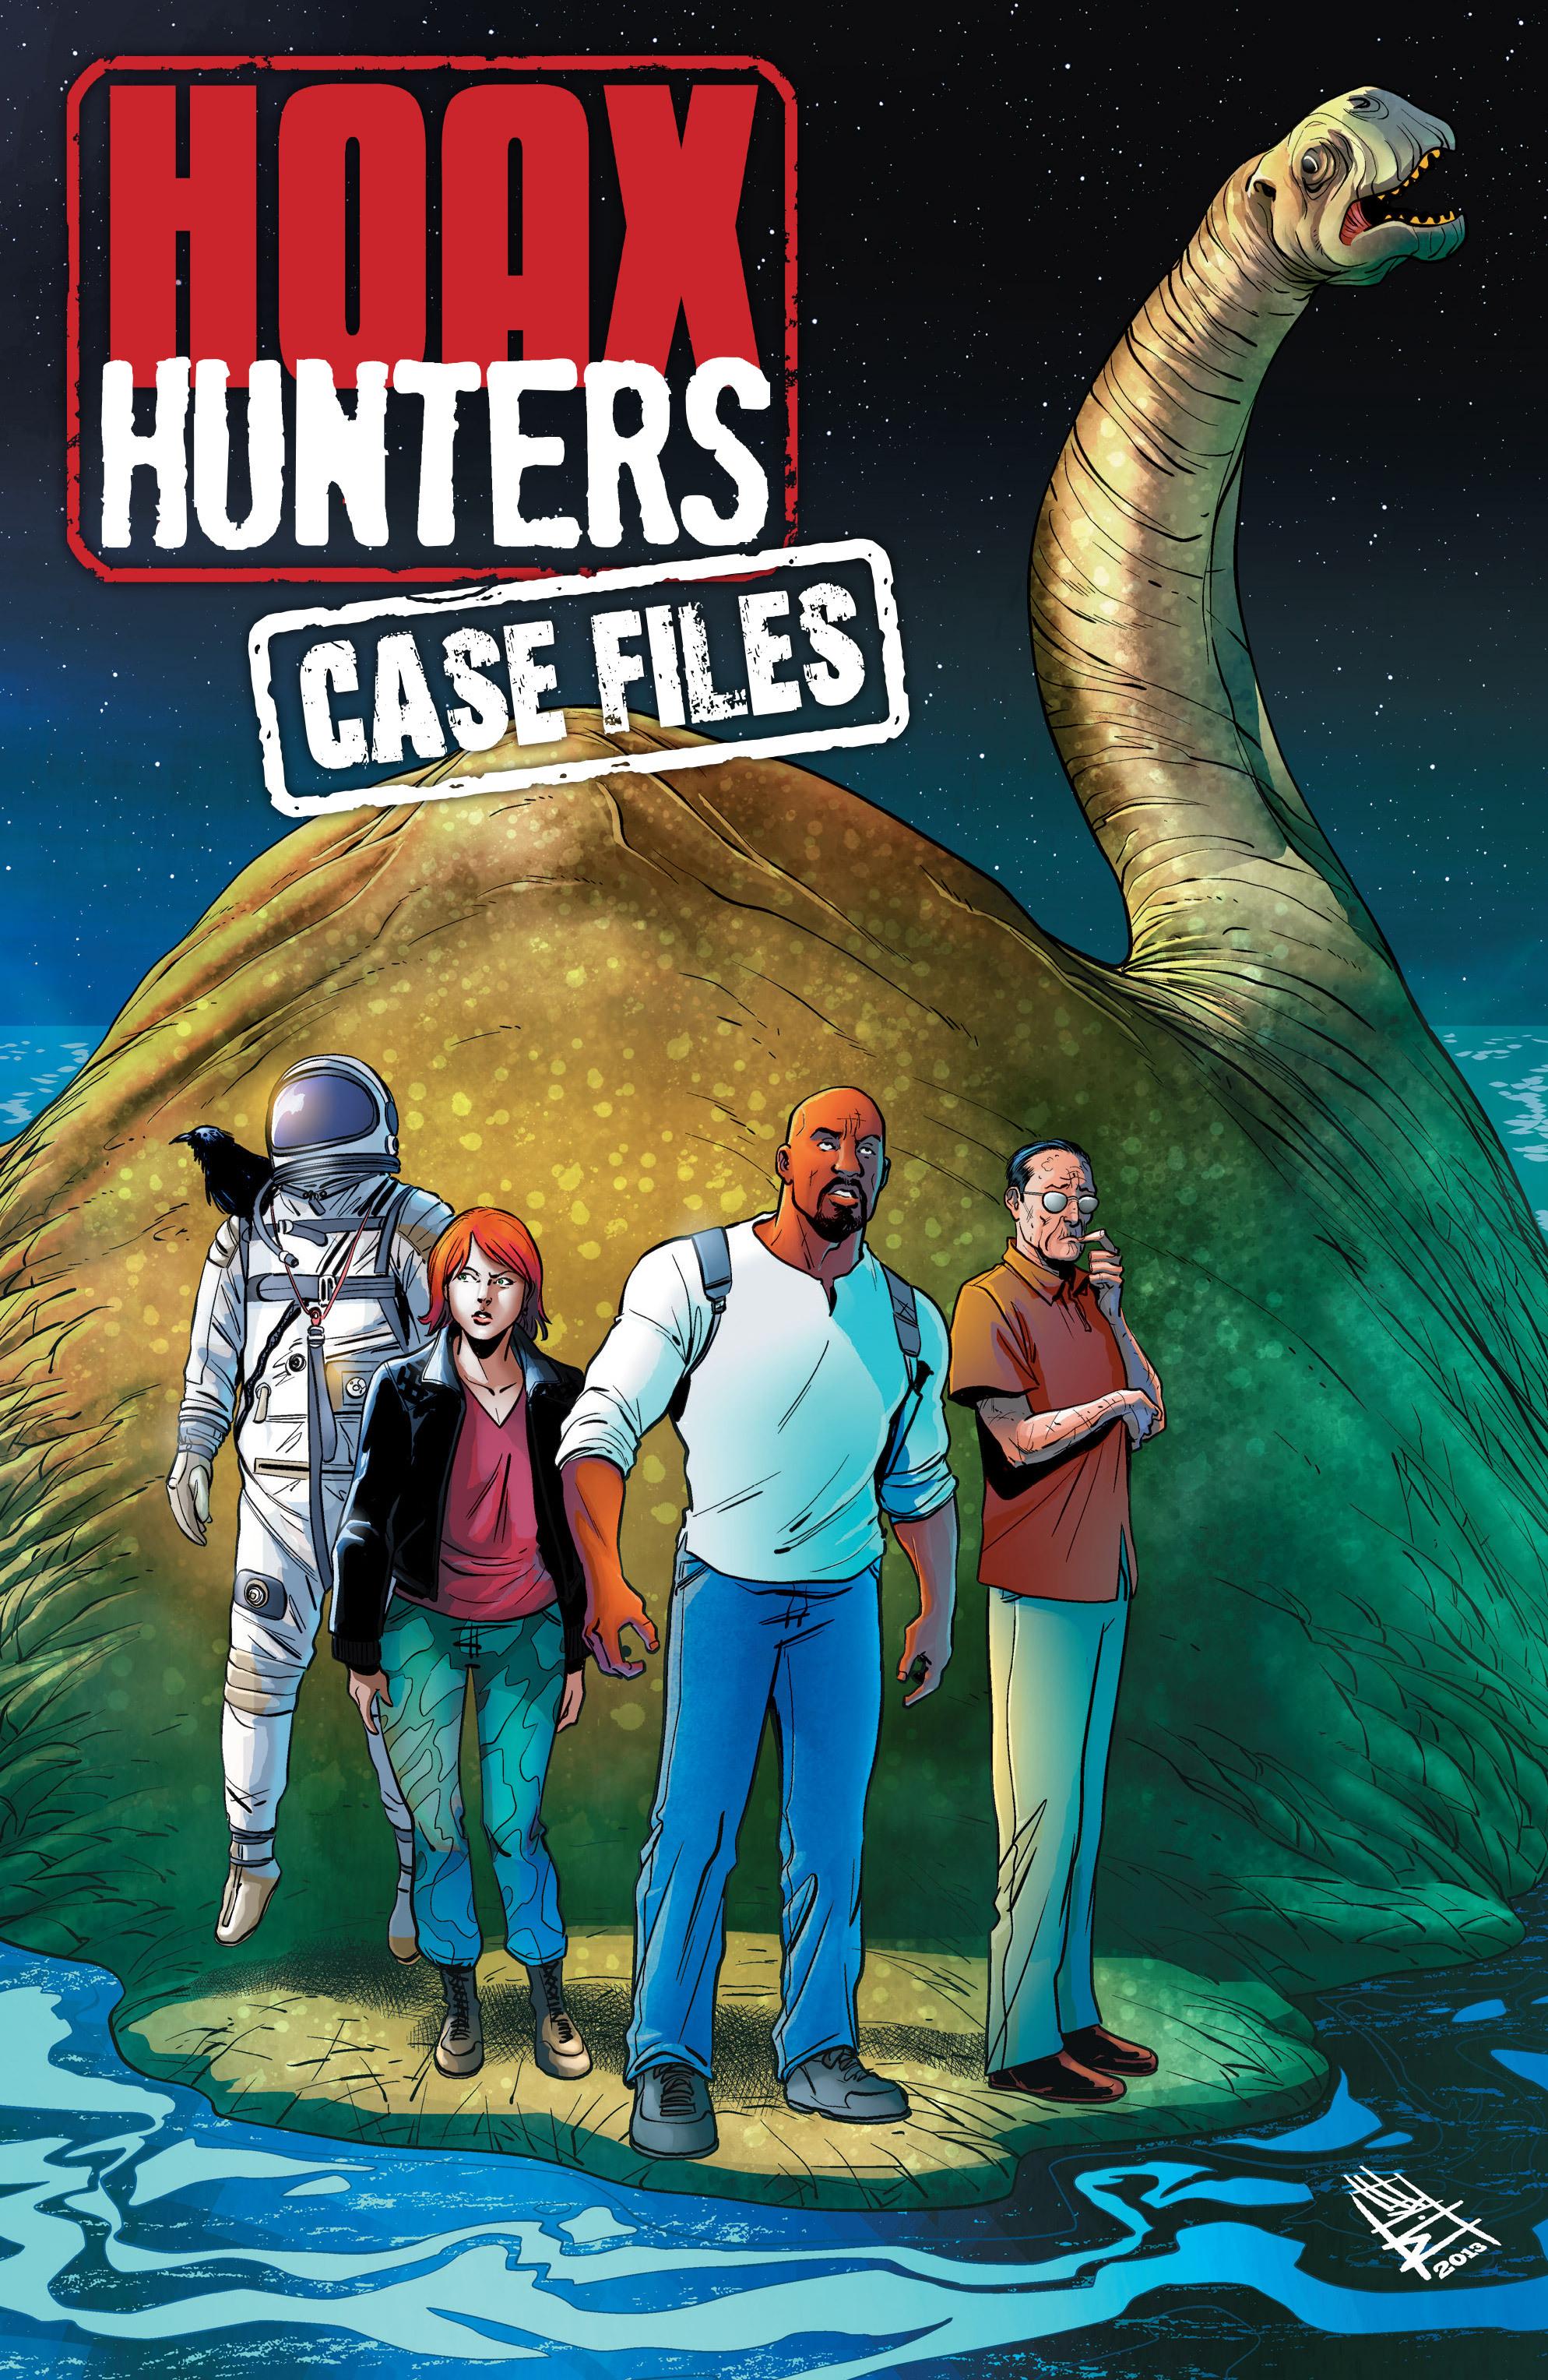 Read online Hoax Hunters (2012) comic -  Issue # TPB 3 - 102